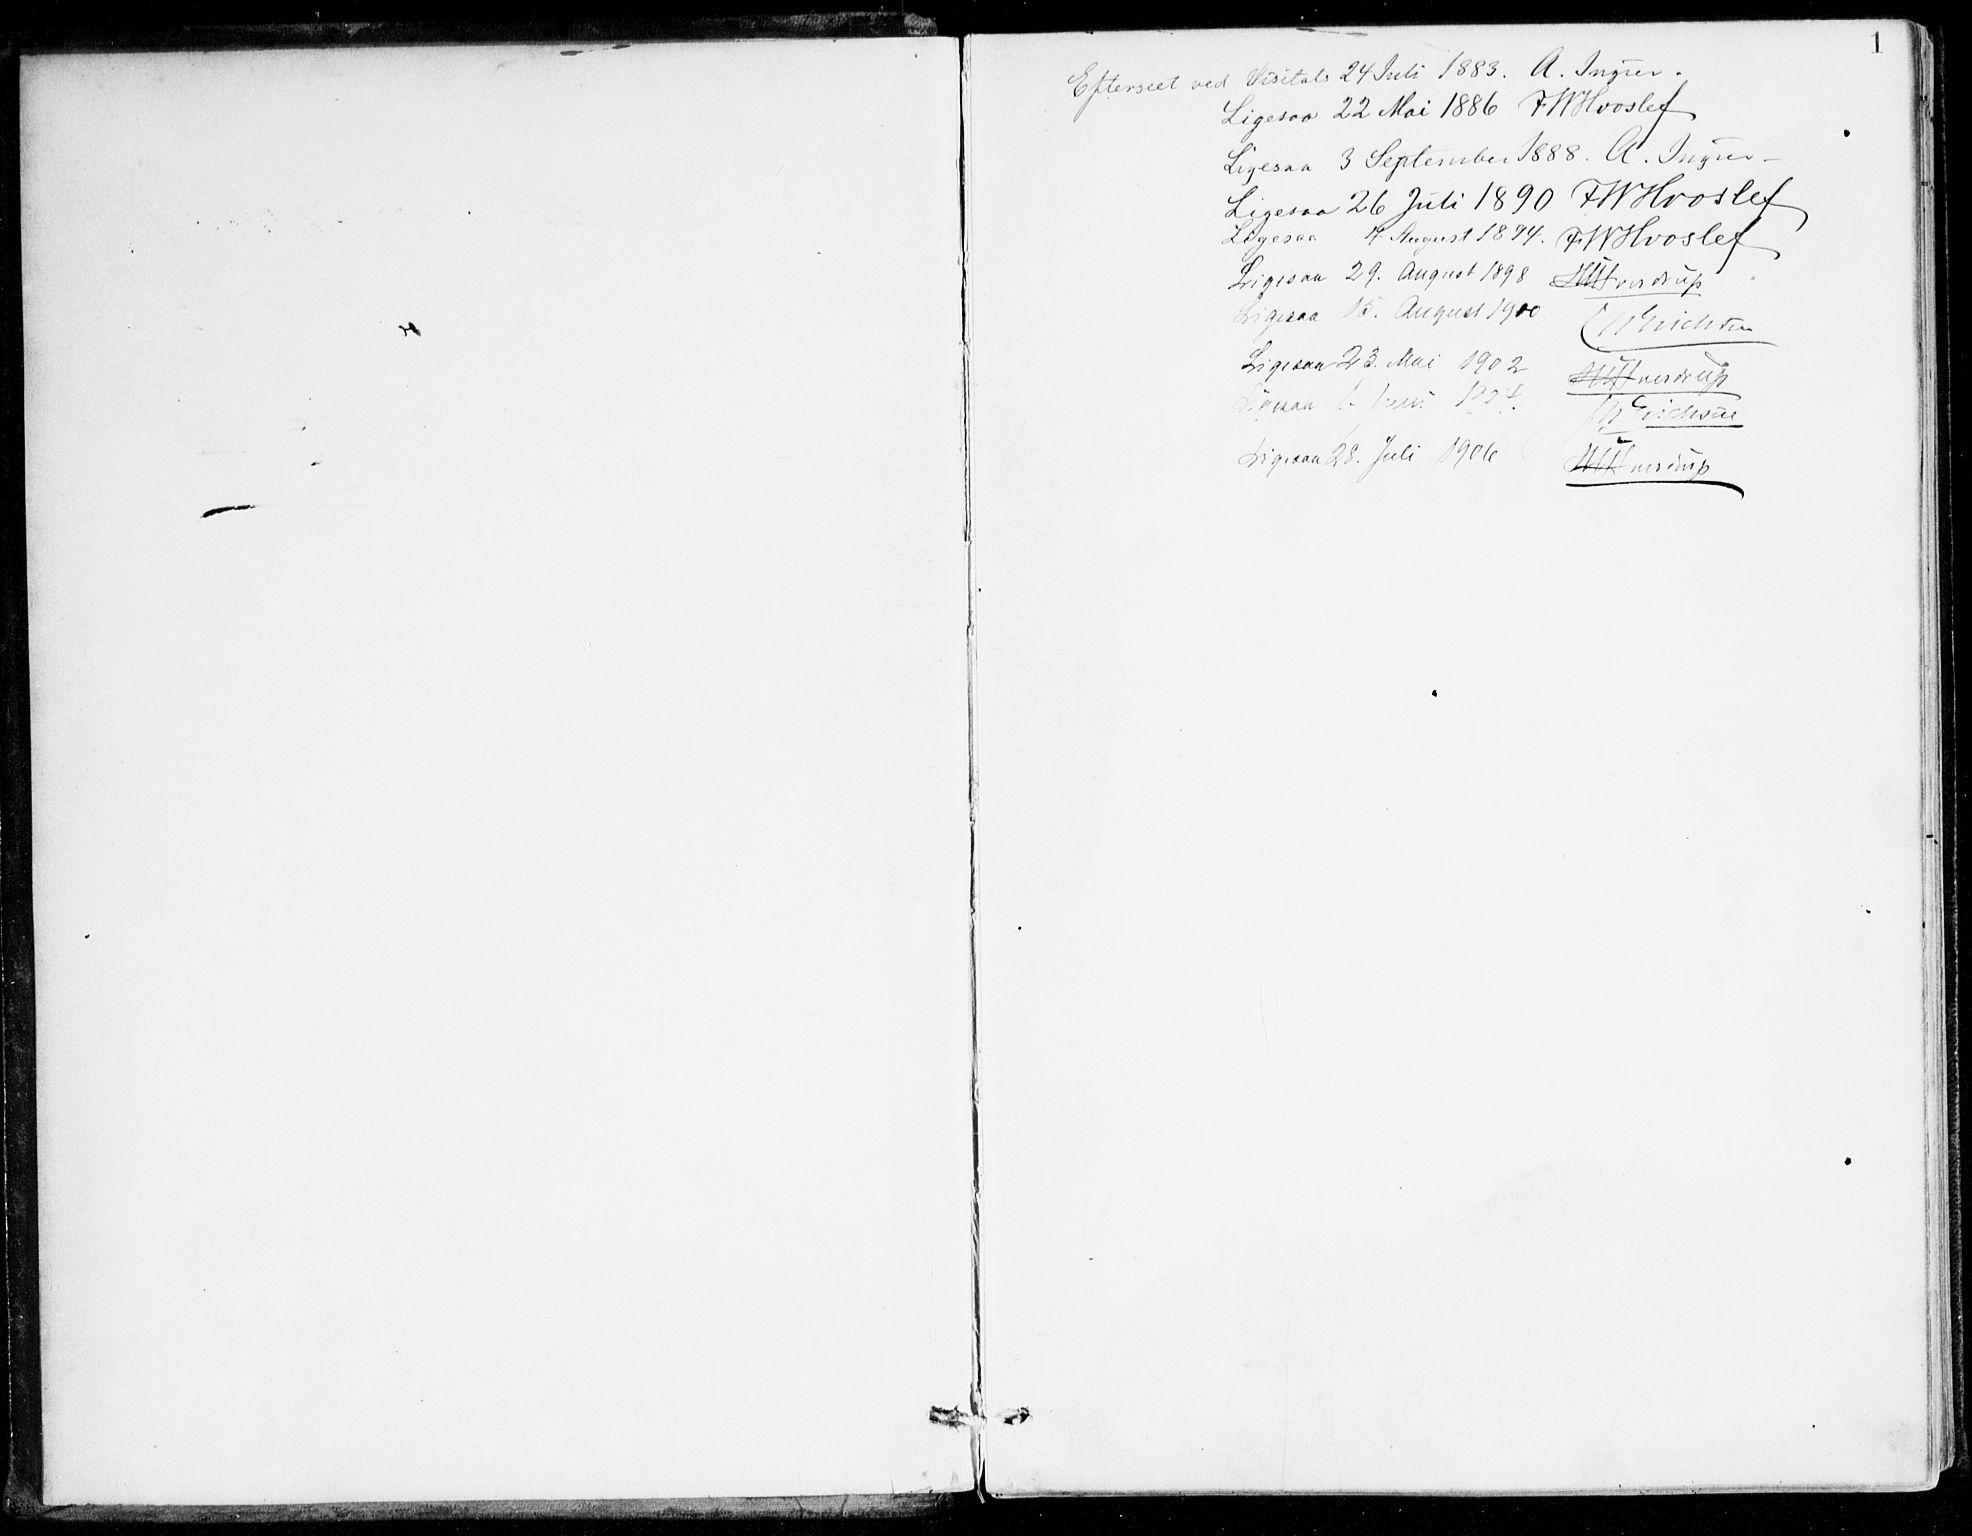 SAB, Lavik Sokneprestembete, Ministerialbok nr. C 1, 1882-1904, s. 1